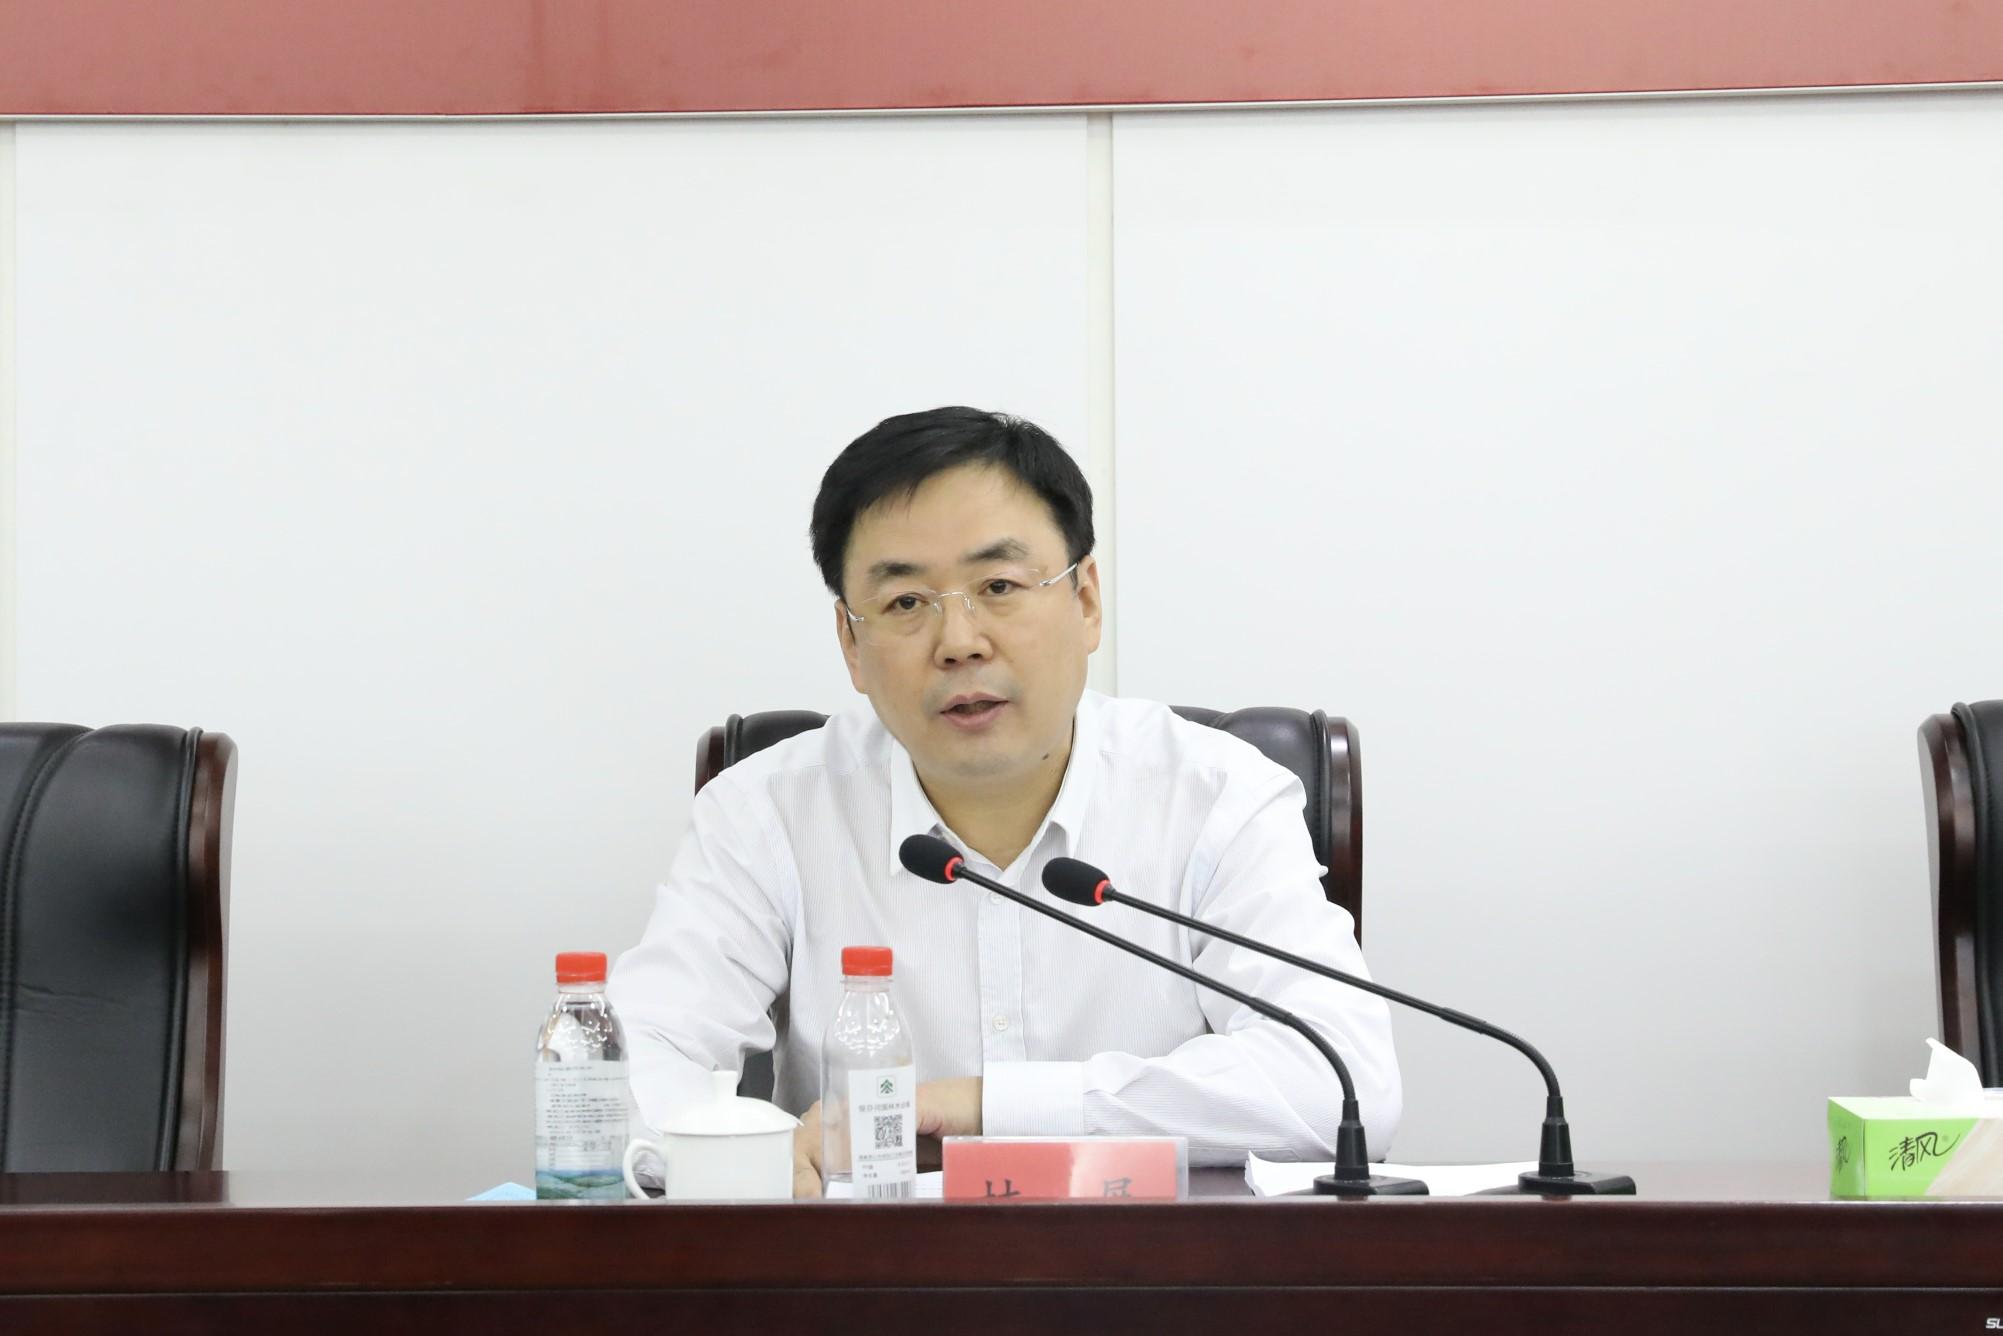 jituan公司zhao开1-5月经济运行穤hi鲷遹e绩考he工zuo会议